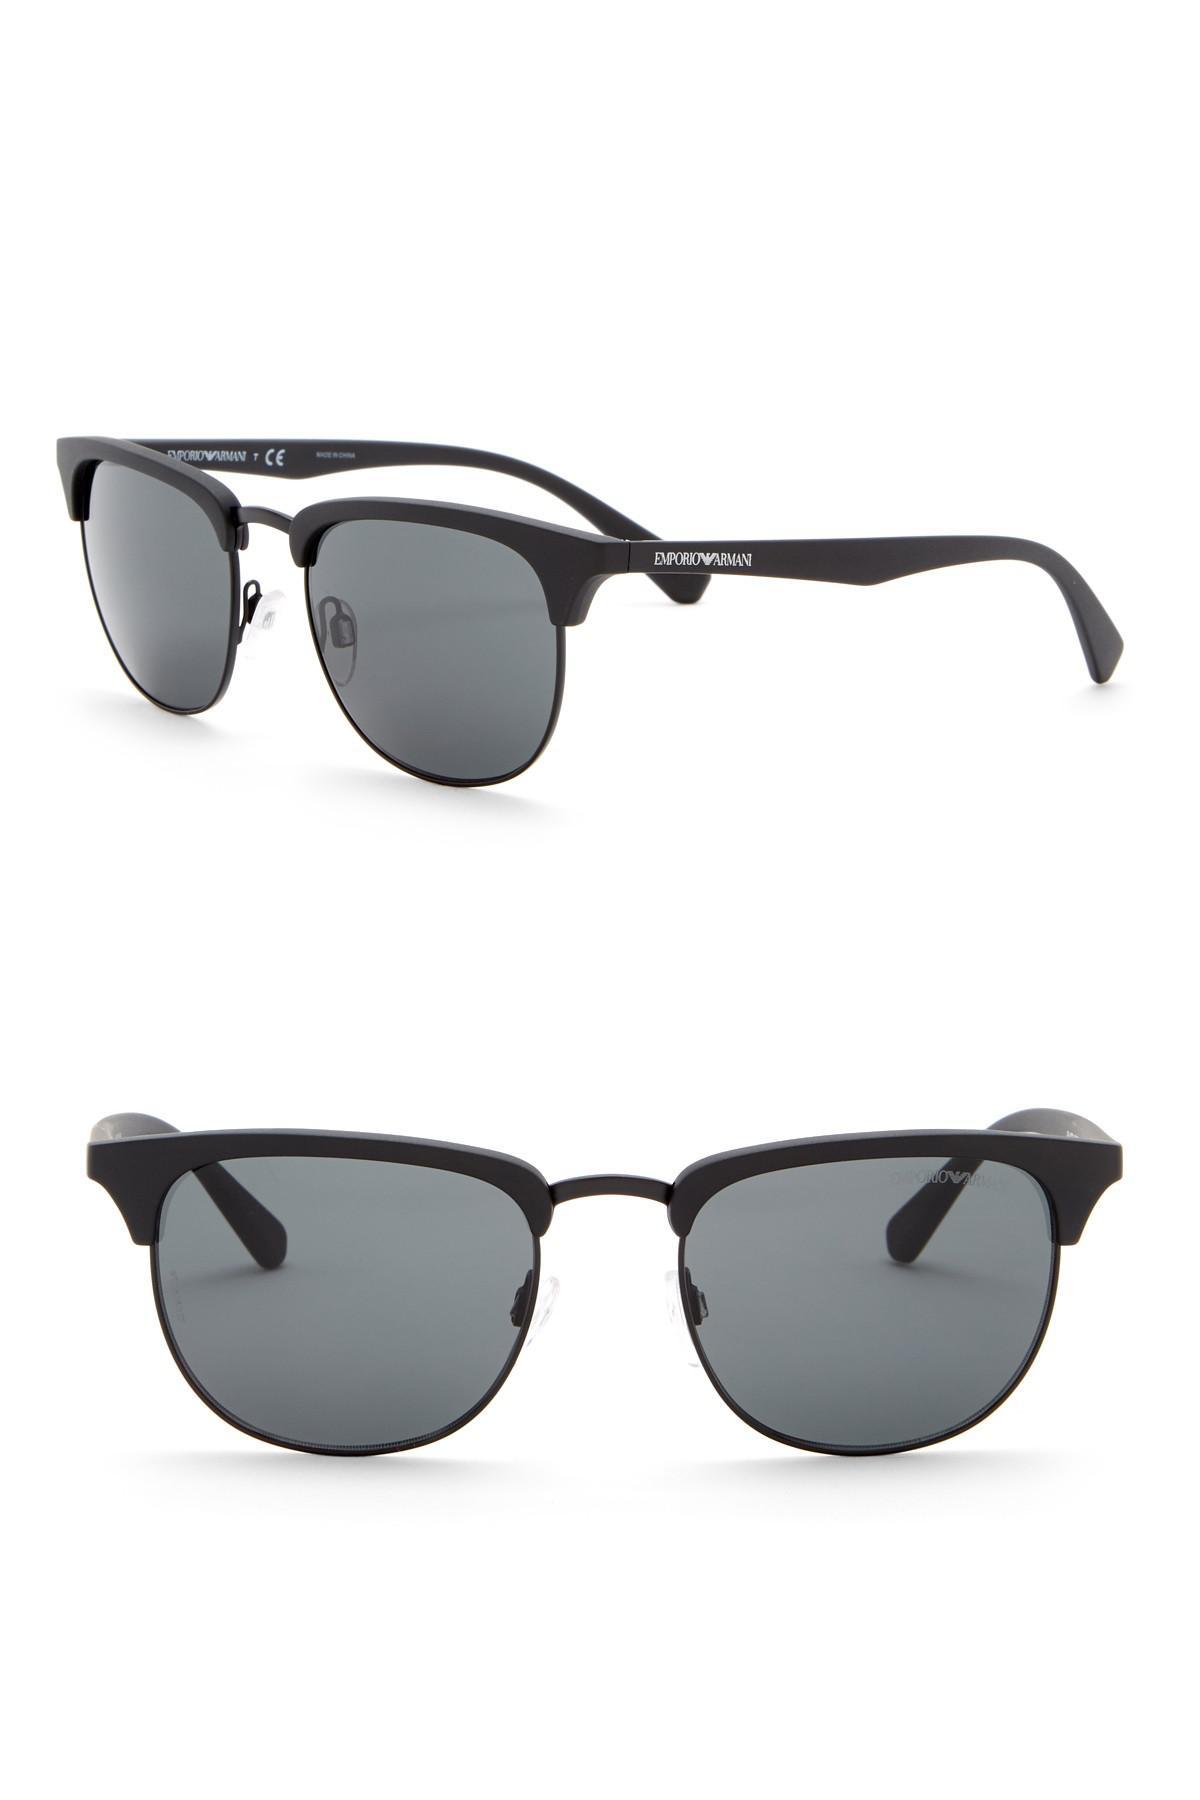 2030c8b70197 Lyst - Emporio Armani 52mm Clubmaster Metal Frame Sunglasses for Men